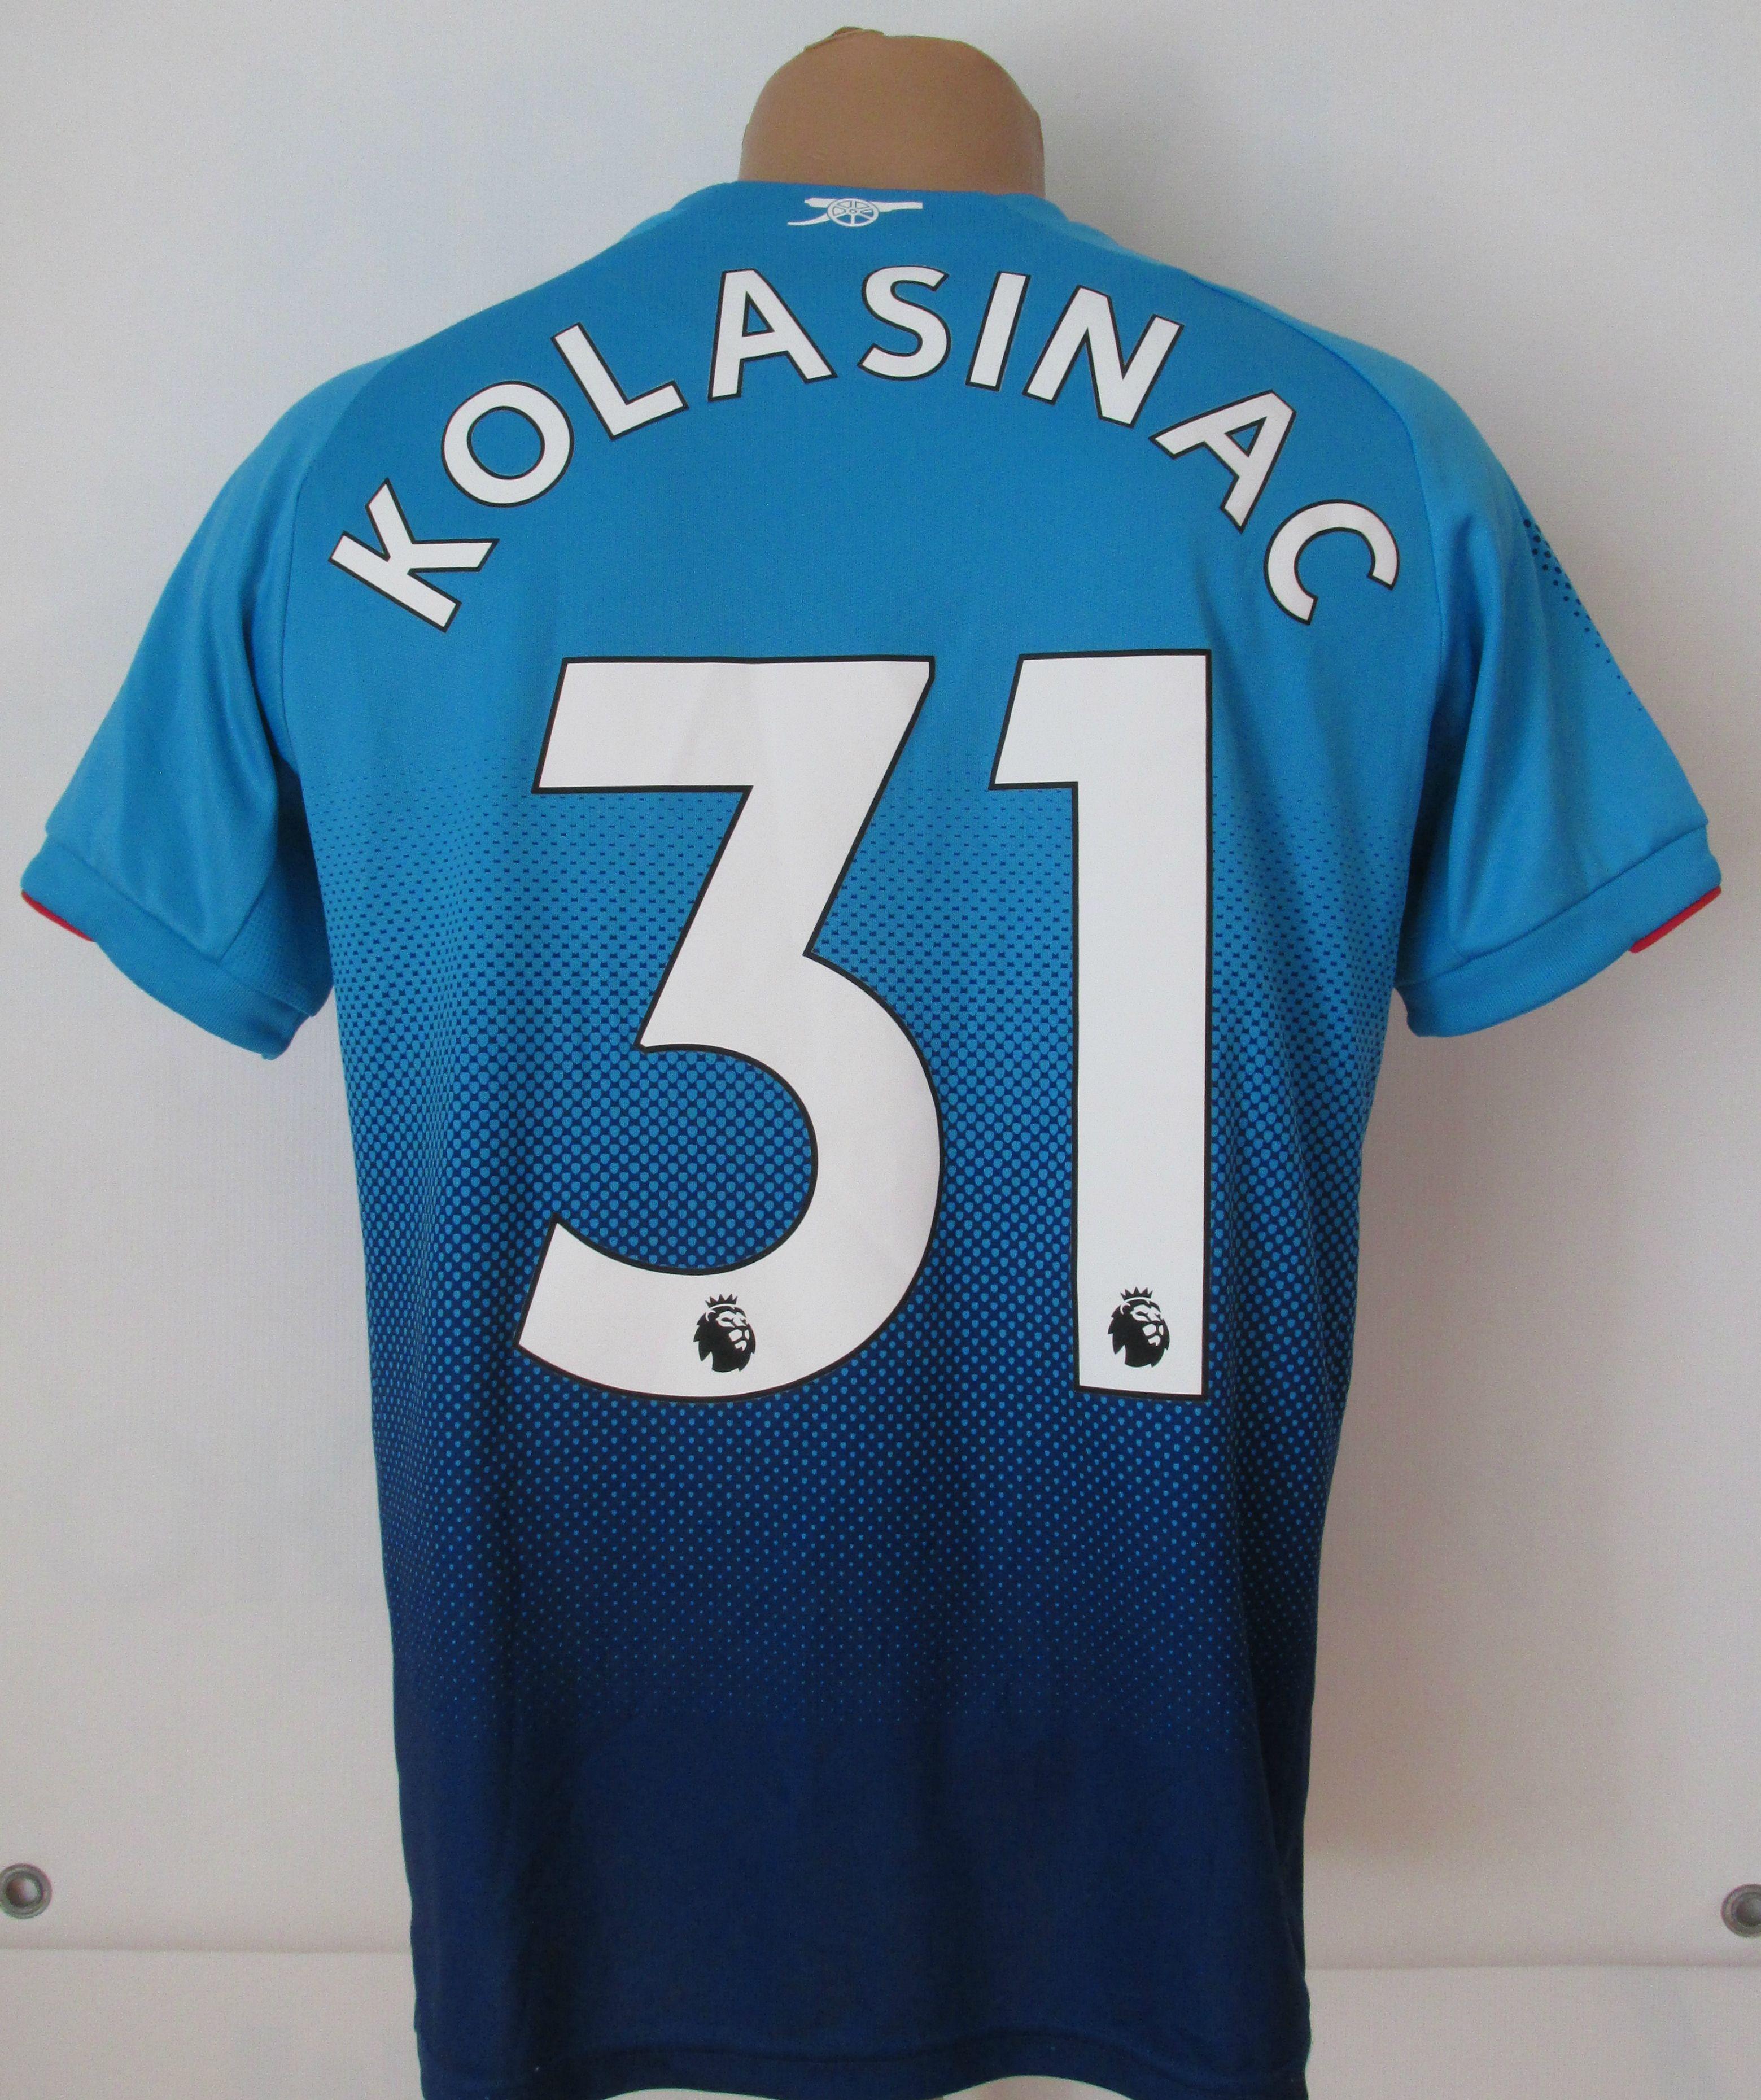 huge selection of 5a5f8 e30c3 Arsenal 2017/2018 away Sead Kolasinac football shirt by Puma ...